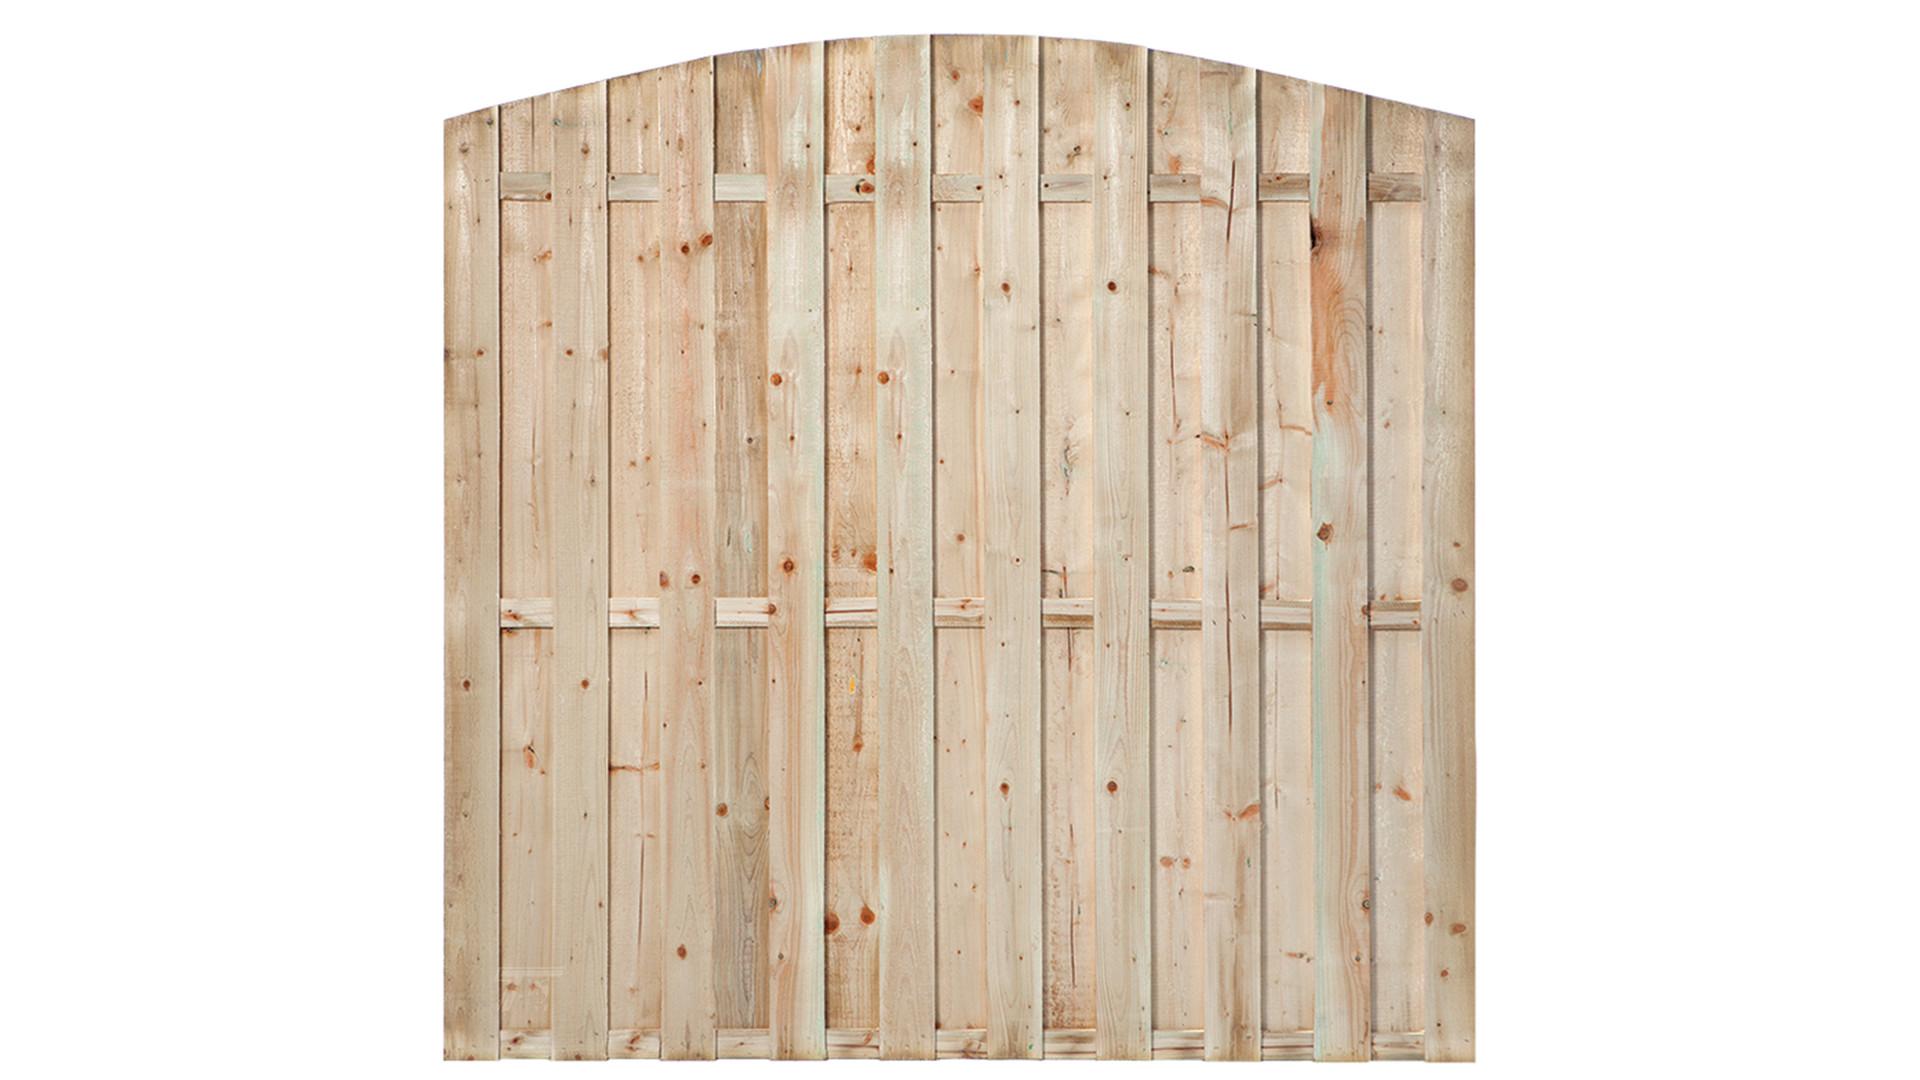 Tuinscherm toog Den Haag 15-planks 180x180 cm